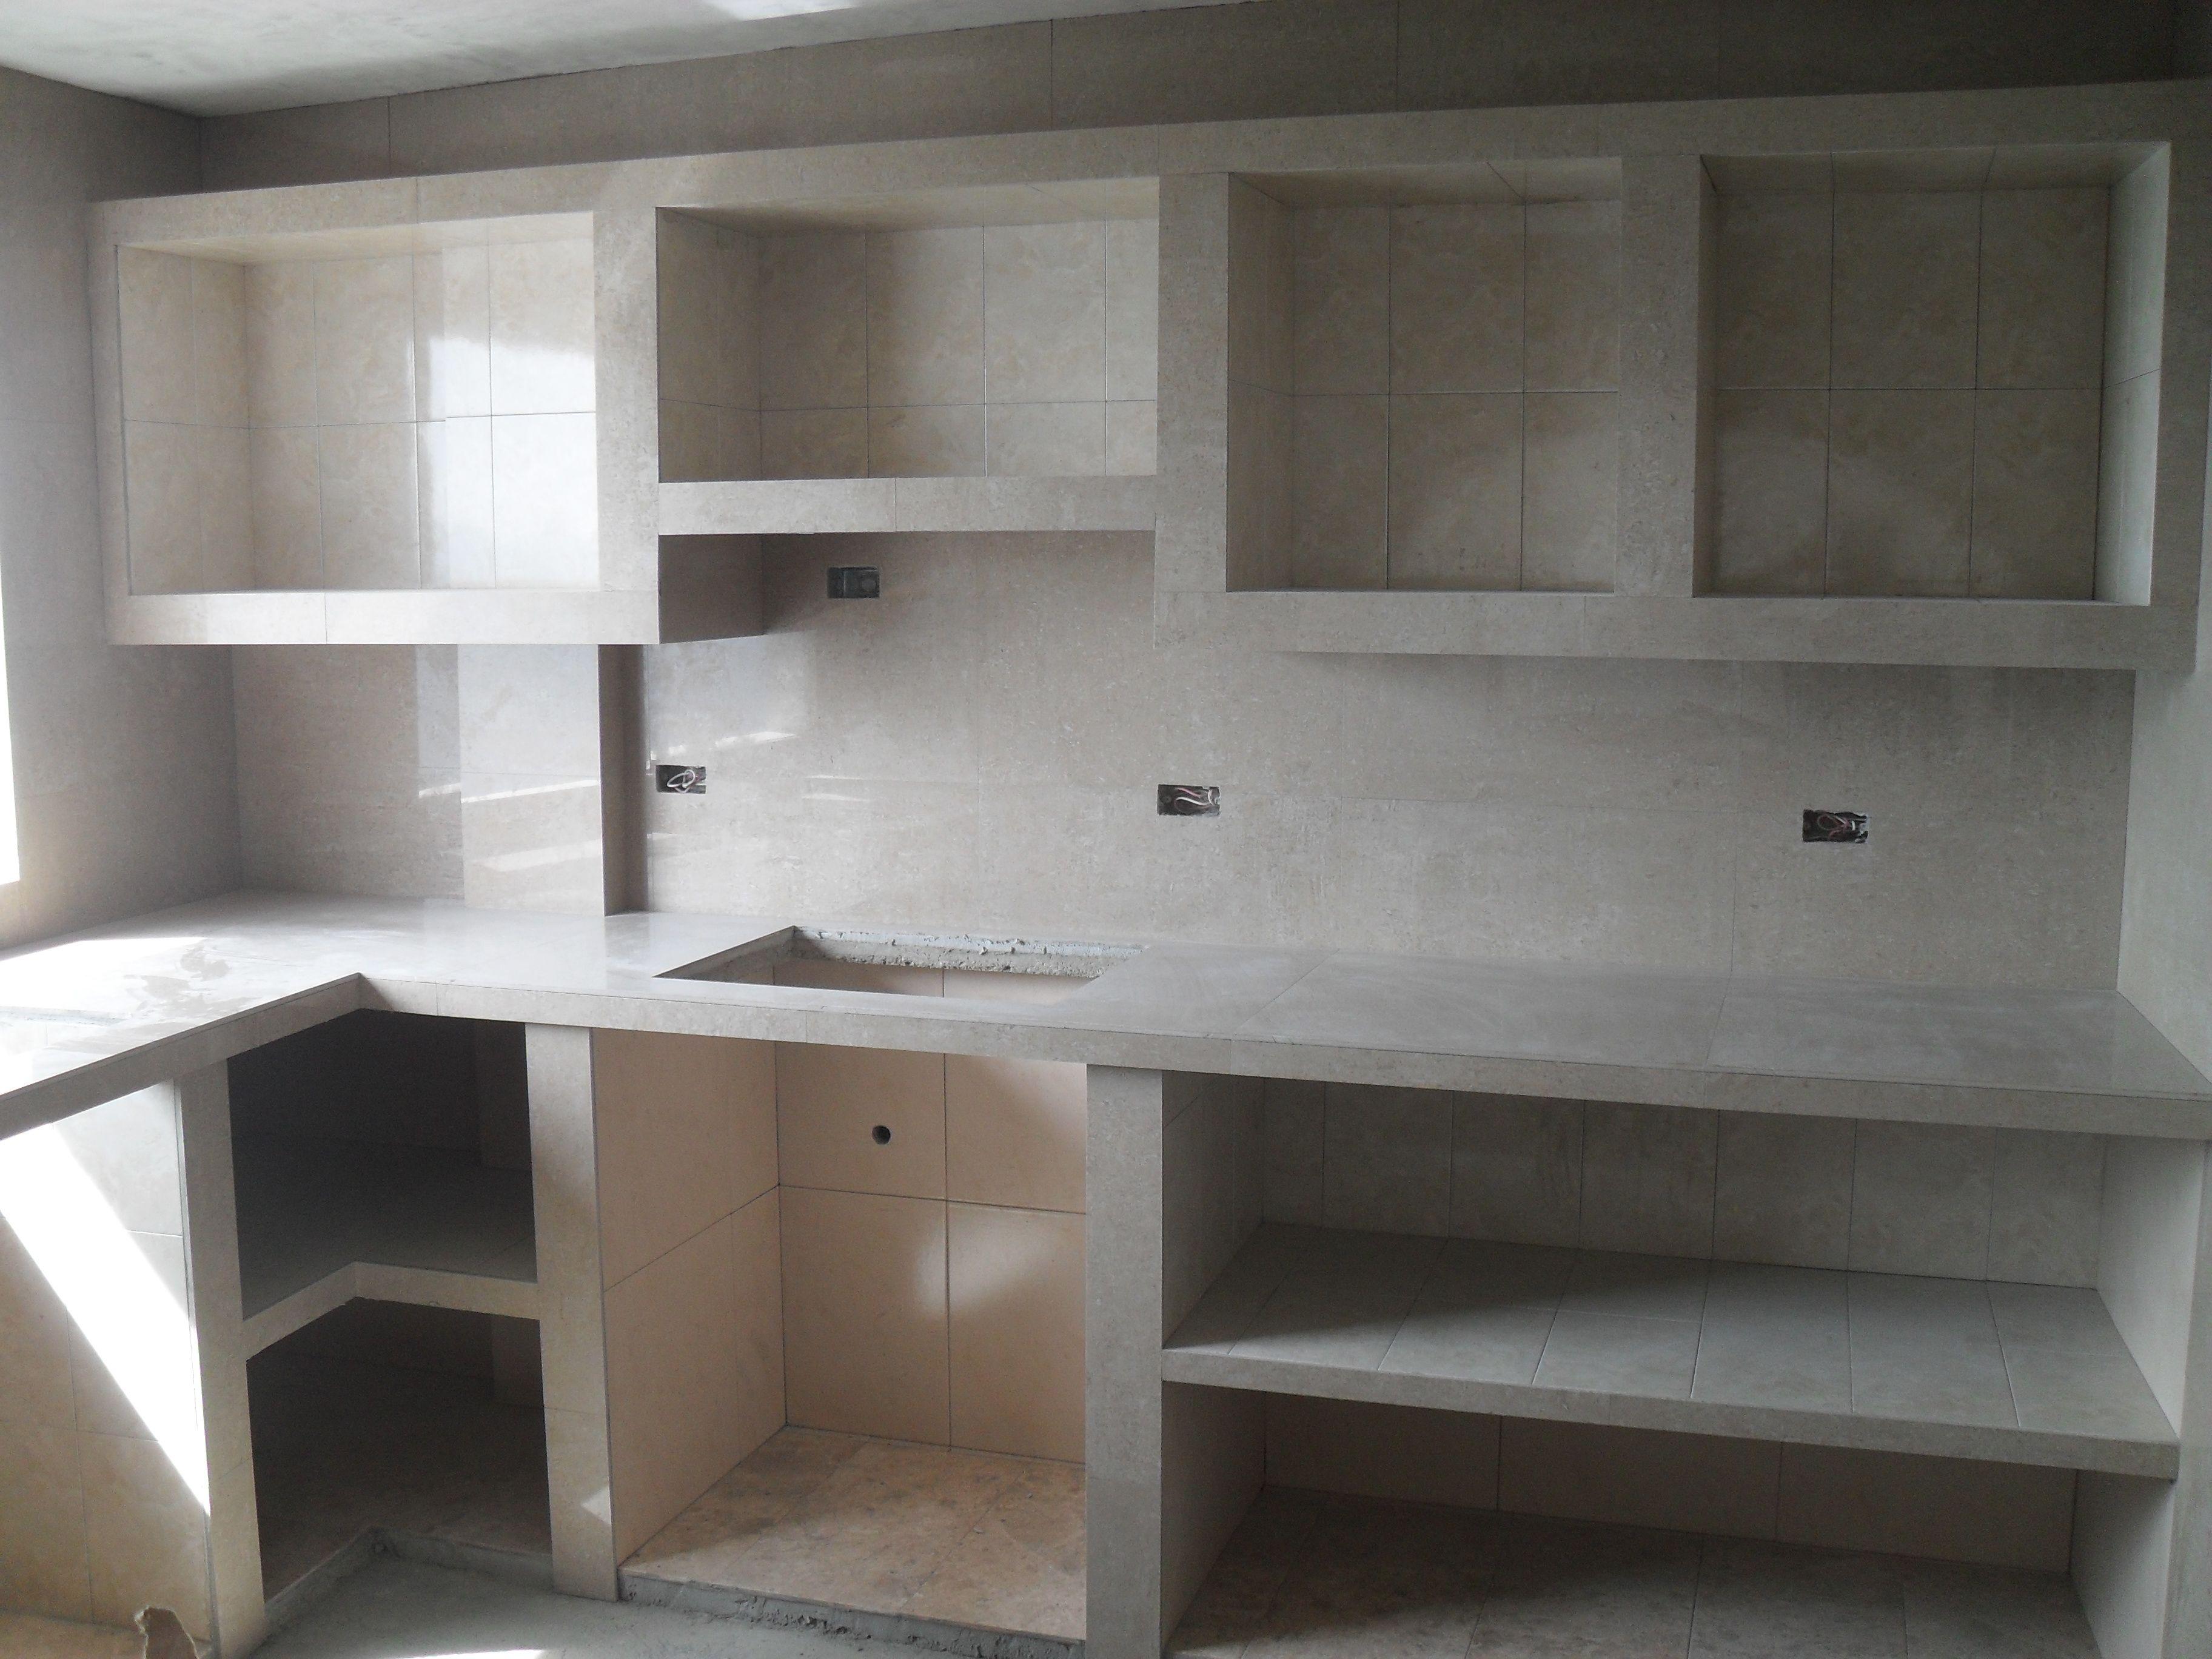 Cocina en mamposter a recubierta con cer mica y for Barras de cocina de concreto